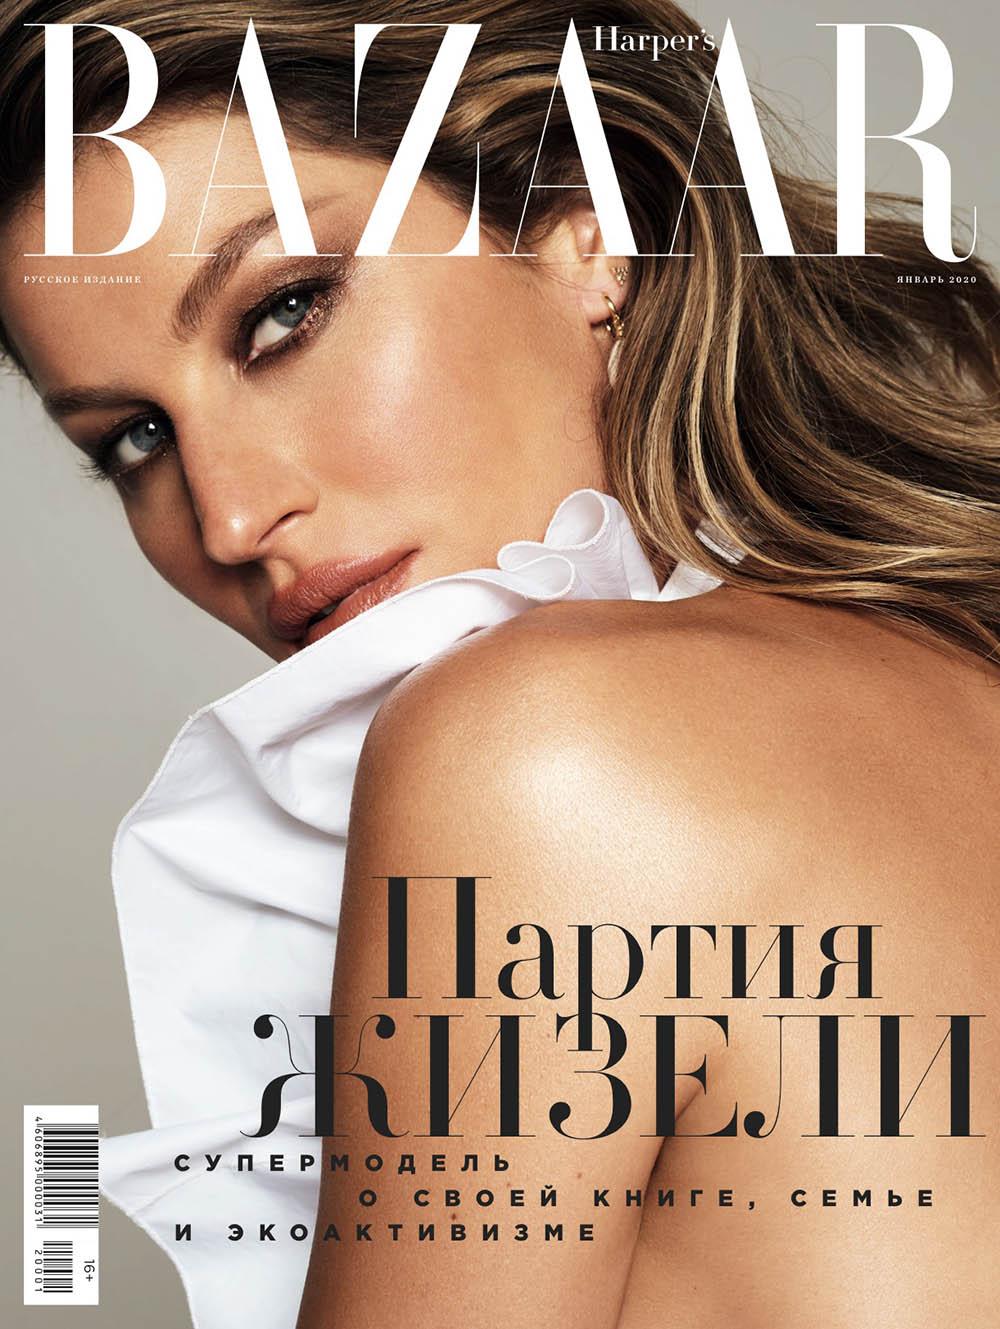 Gisele Bündchen covers Harper's Bazaar Russia January 2020 by Kevin O'Brien